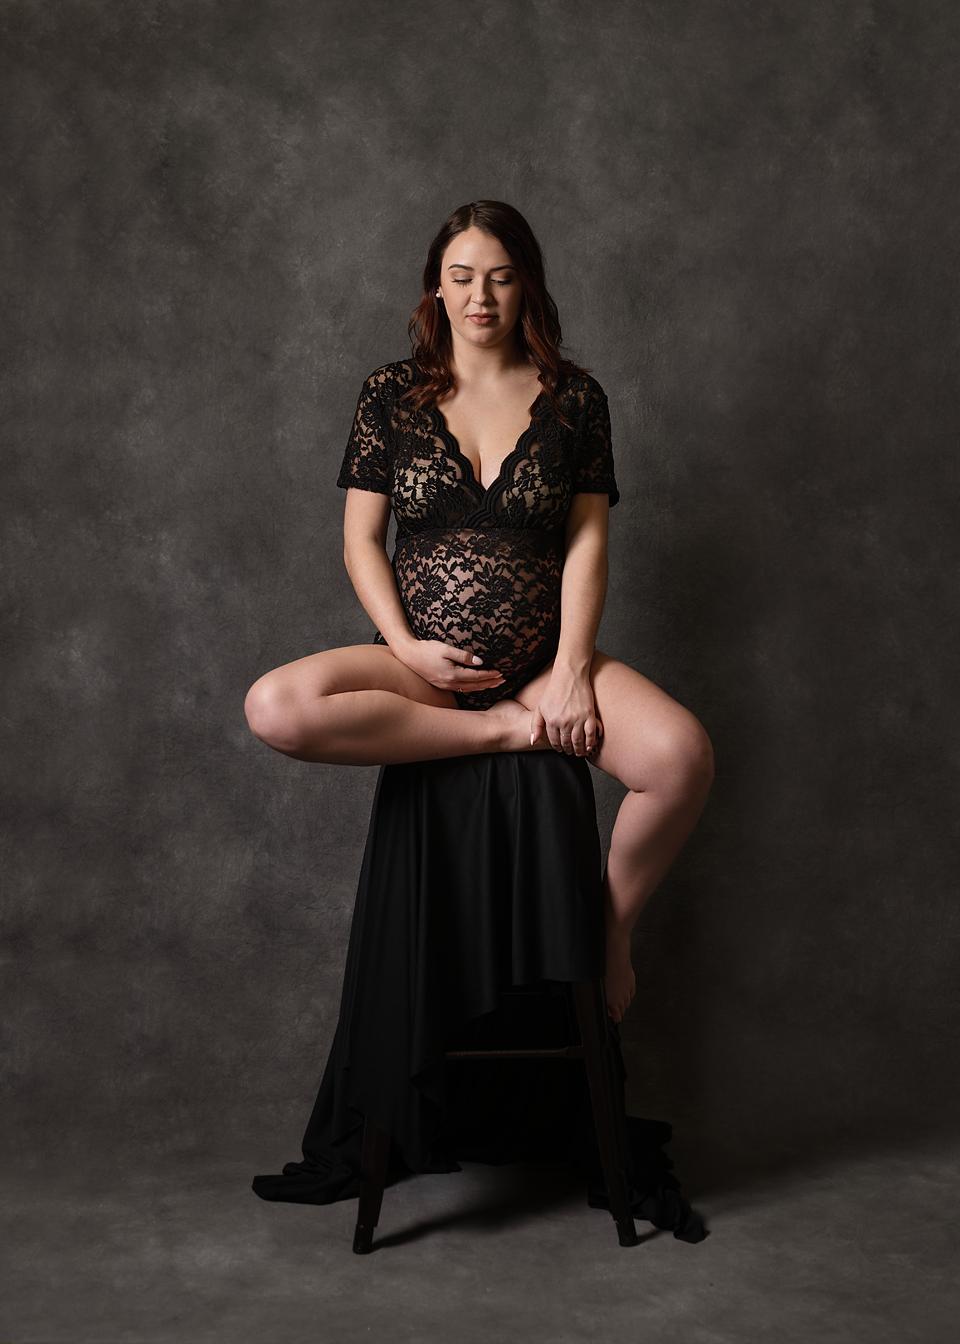 Aberdeen maternity photographe